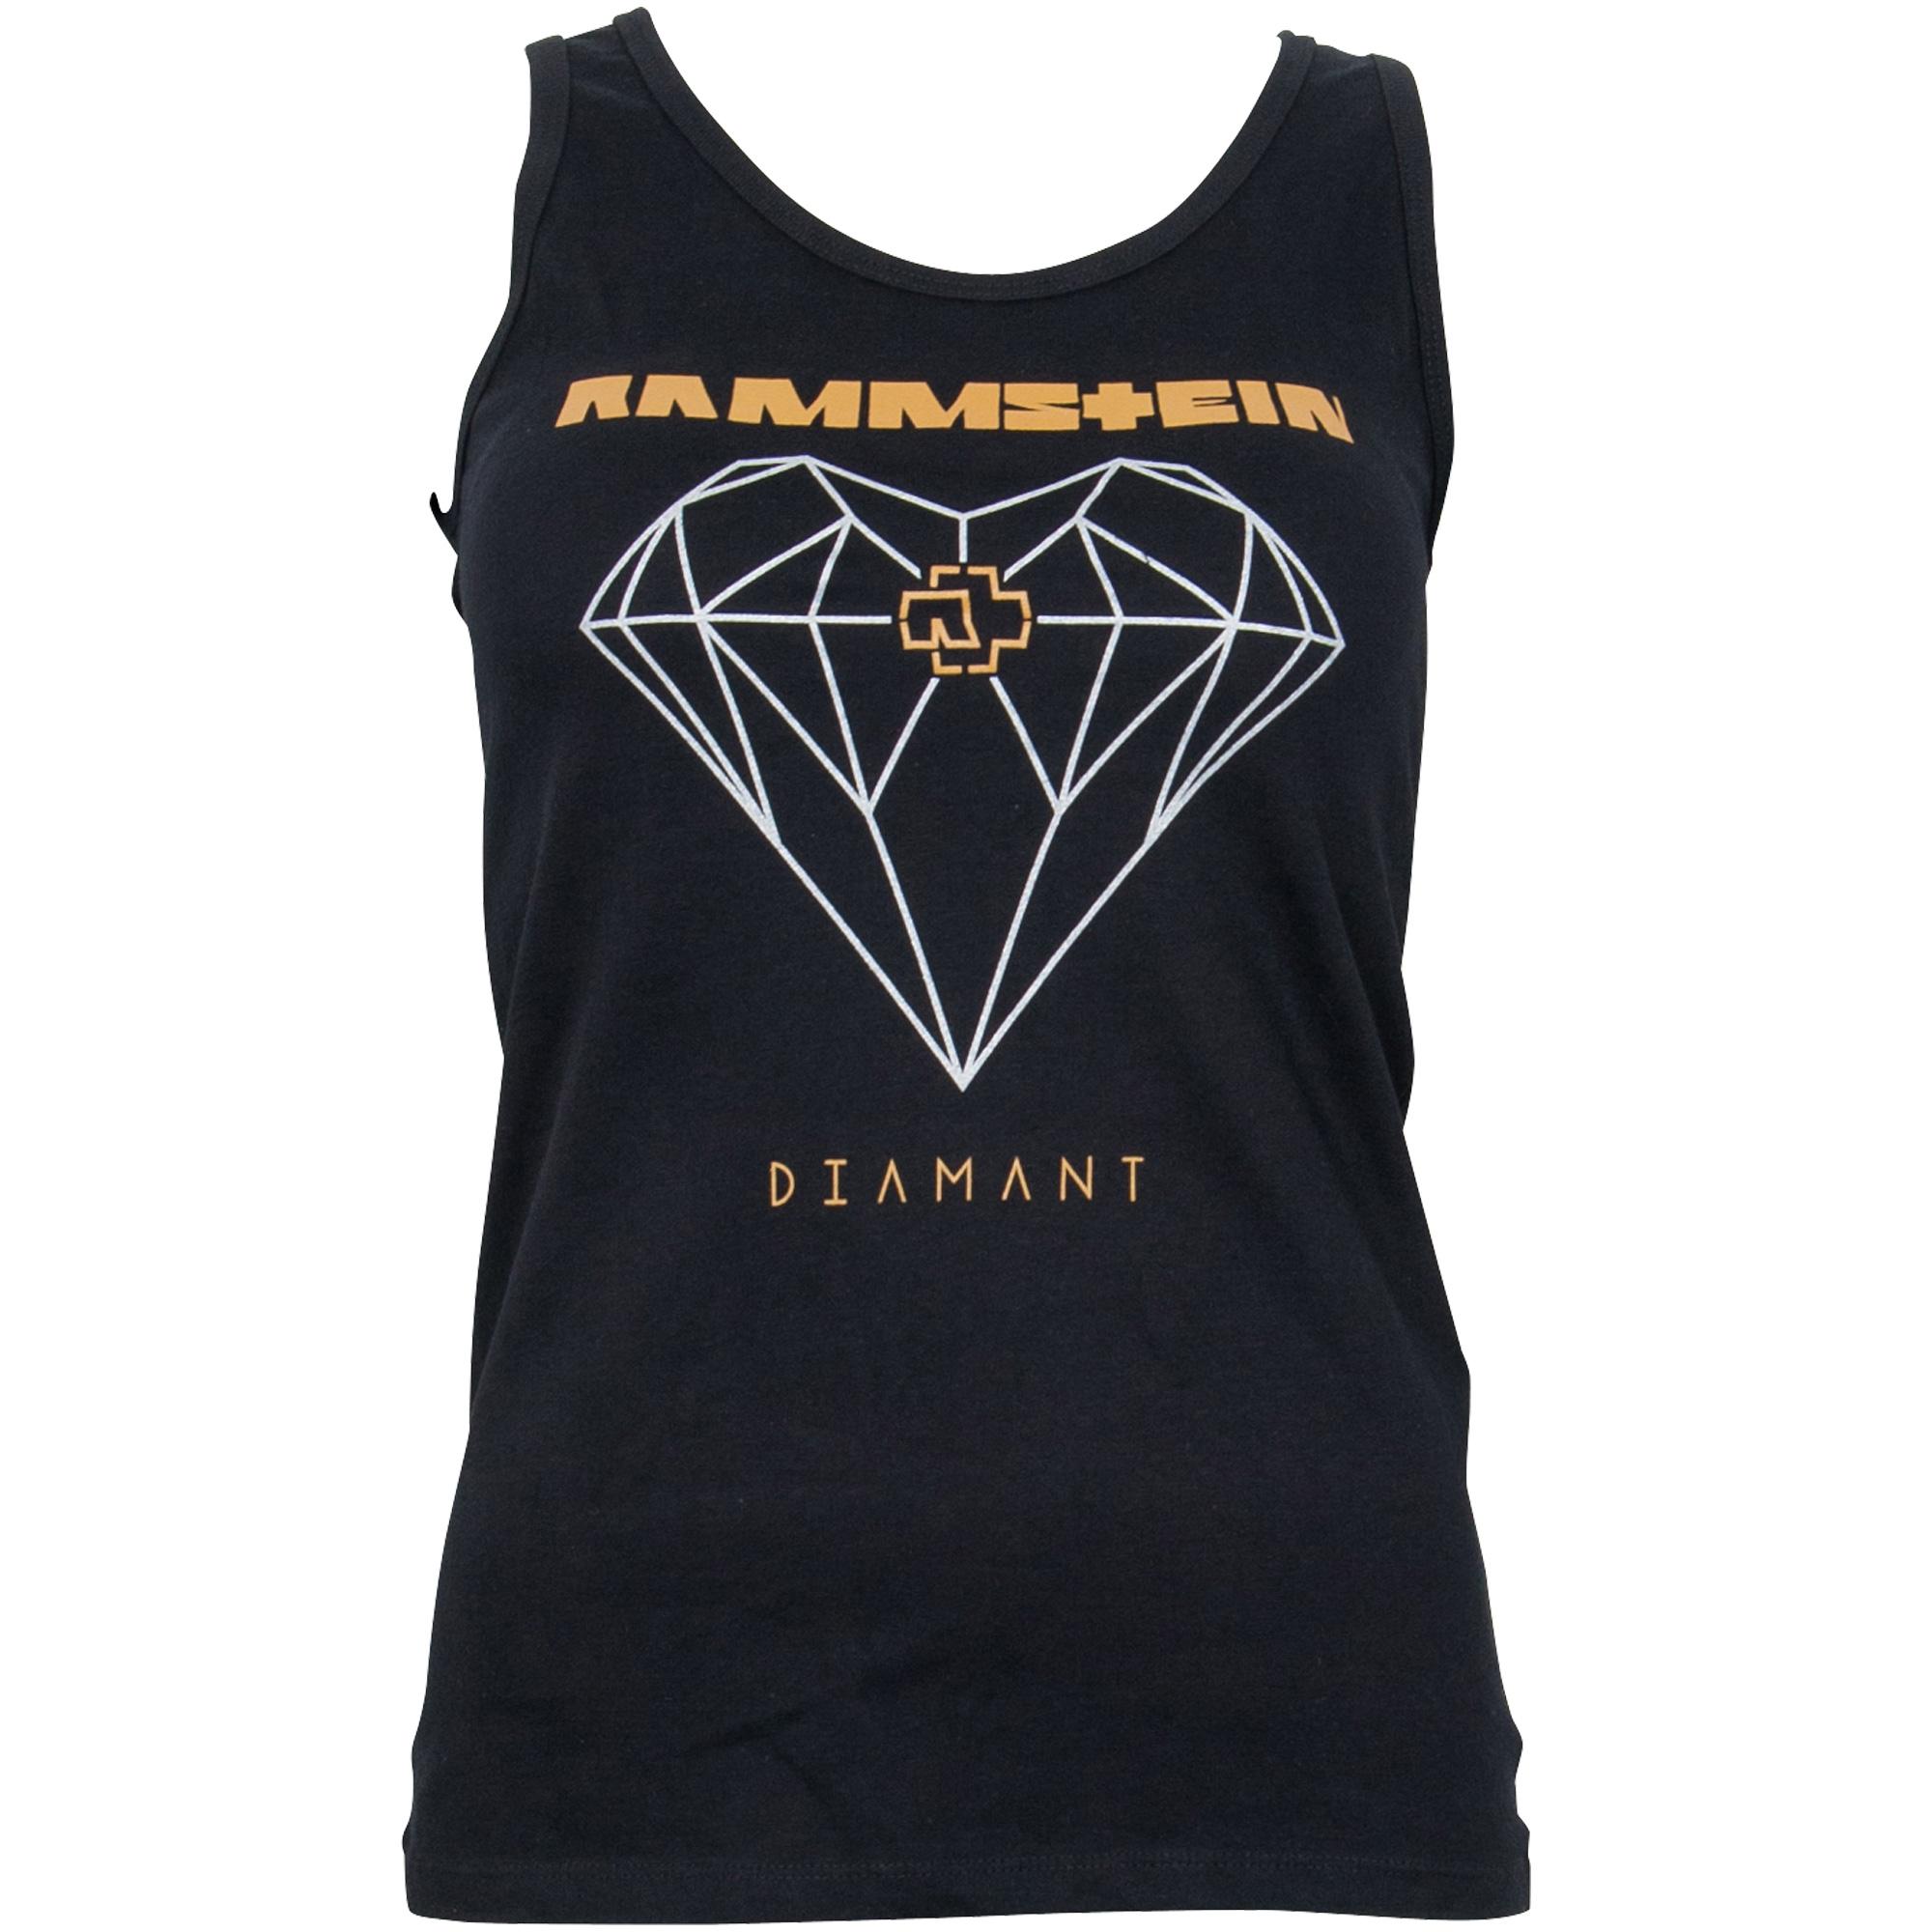 Rammstein - Girly Tanktop - Diamant - schwarz